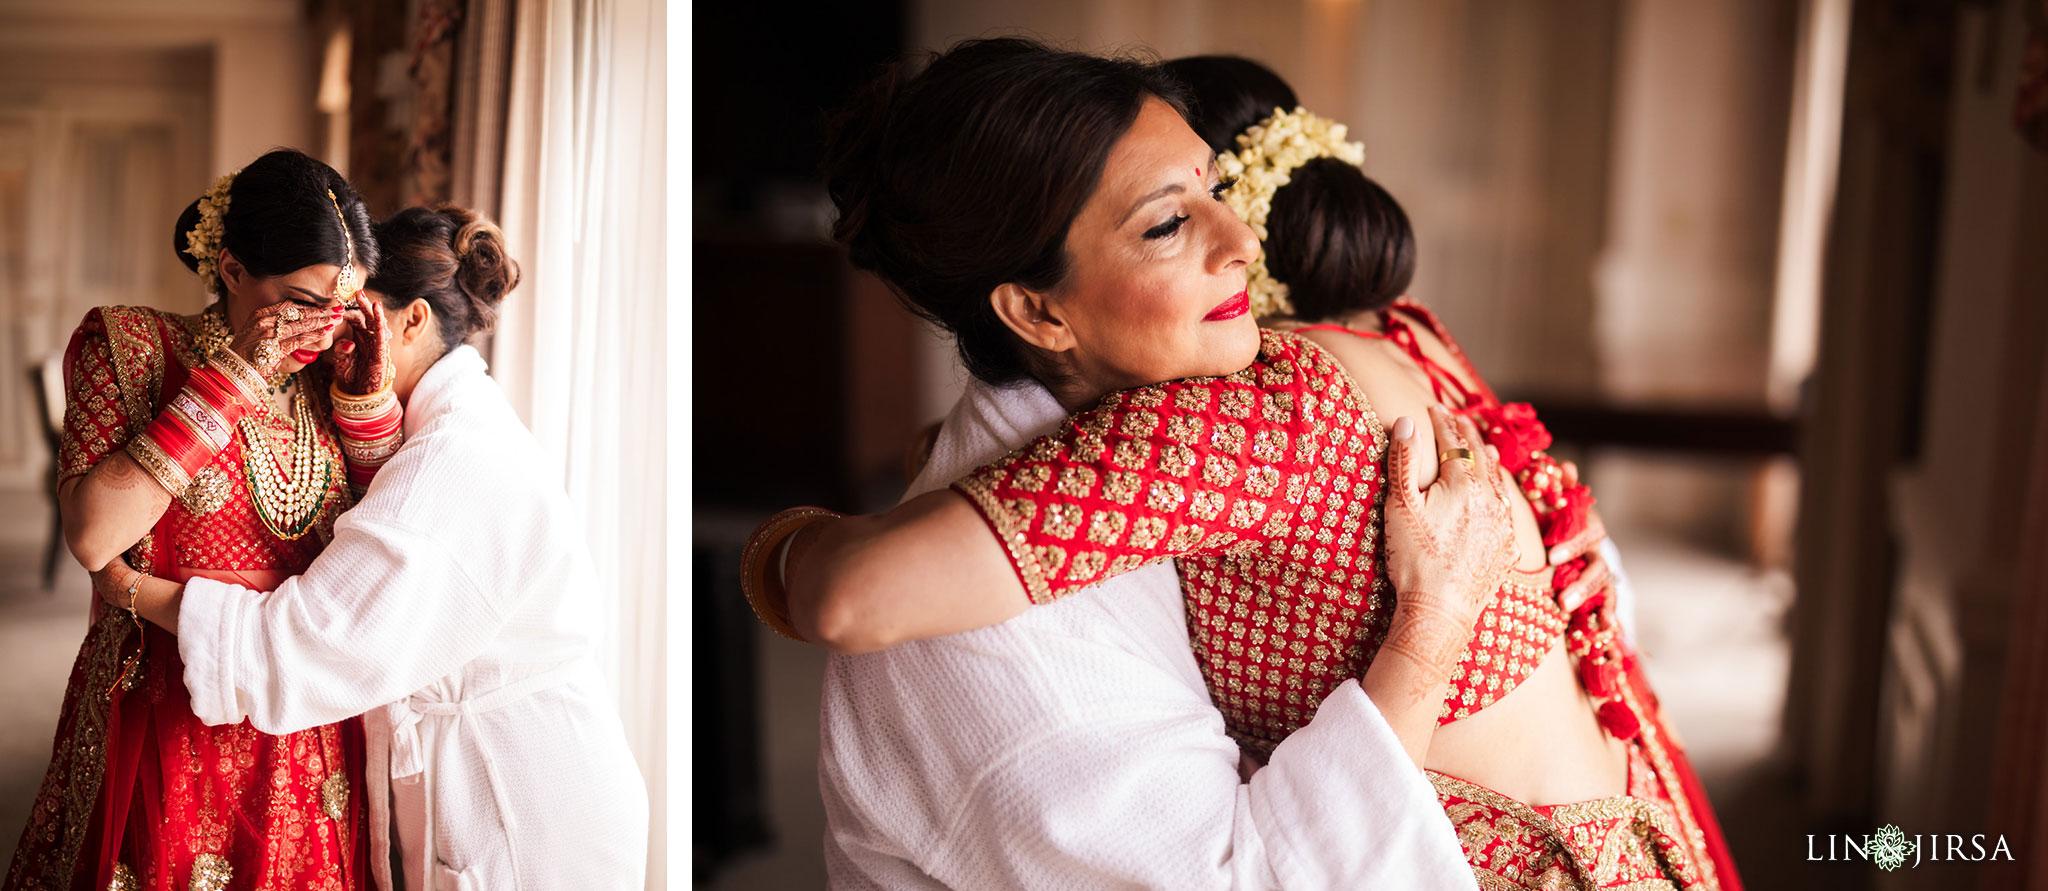 10 Ritz Carlton St Louis Missouri Indian Wedding Photography